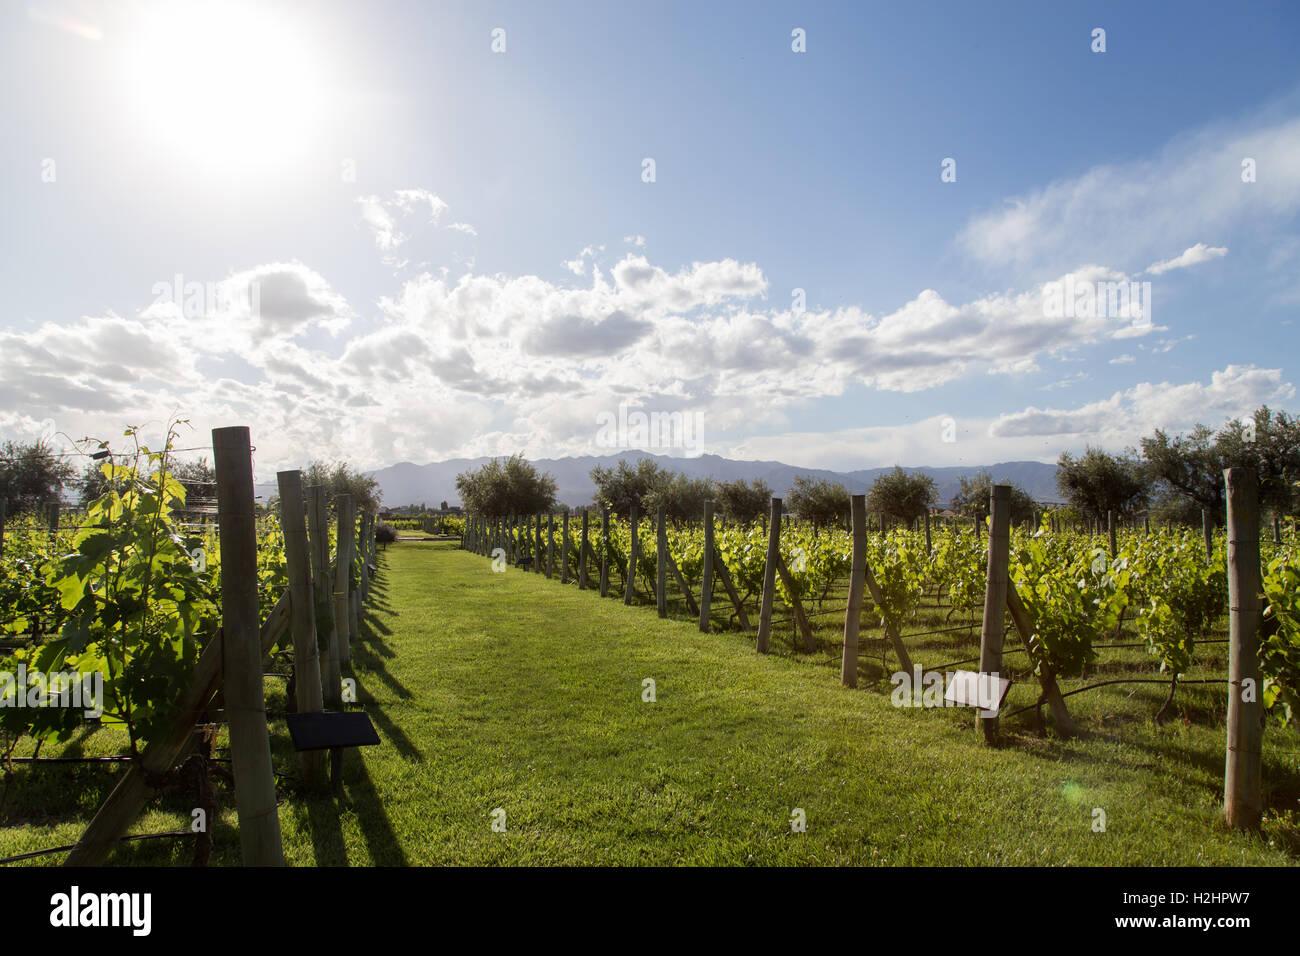 Beautiful vineyard in Mendoza, Argentina - Stock Image